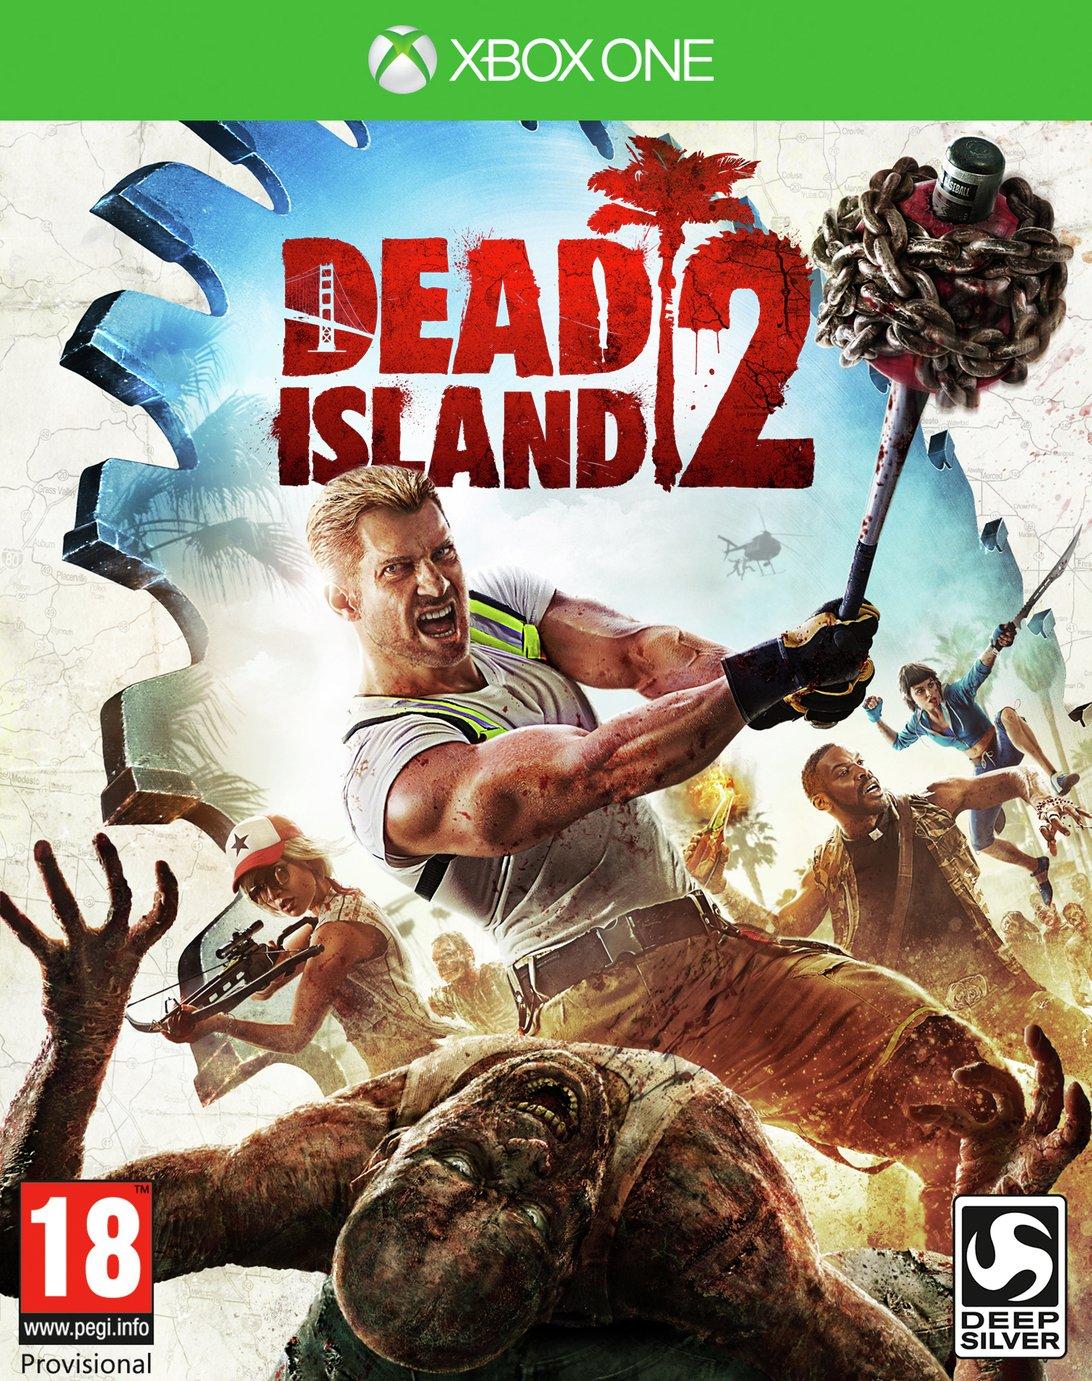 Dead Island 2 Xbox One Pre-order Game.